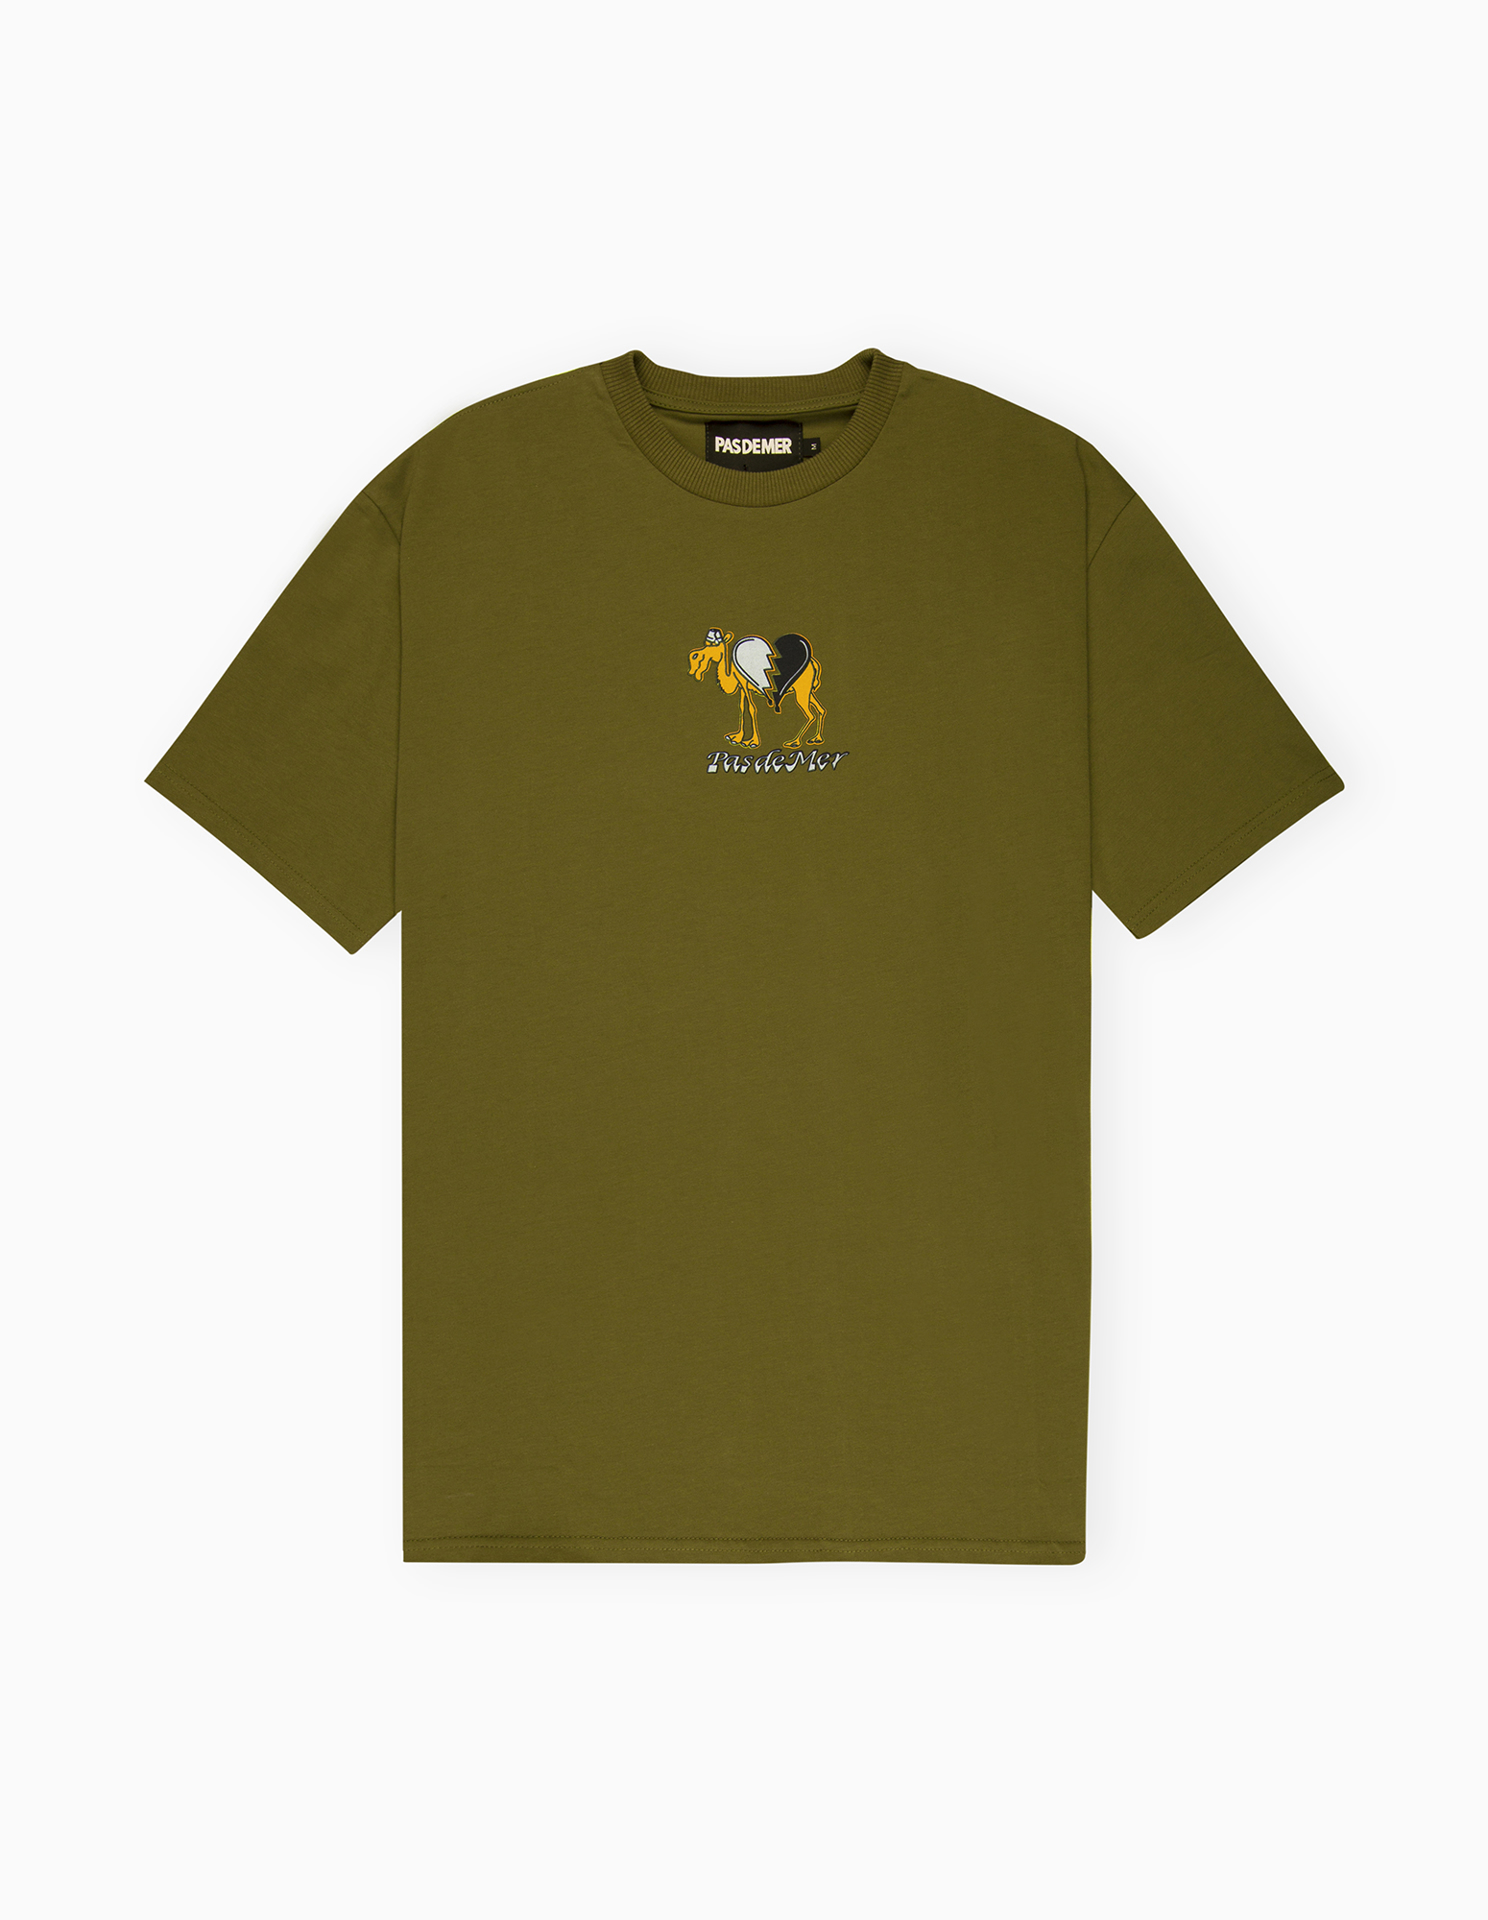 【PAS DE MER/パドゥメ】CAMEL T-SHIRT Tシャツ / ARMY GREEN